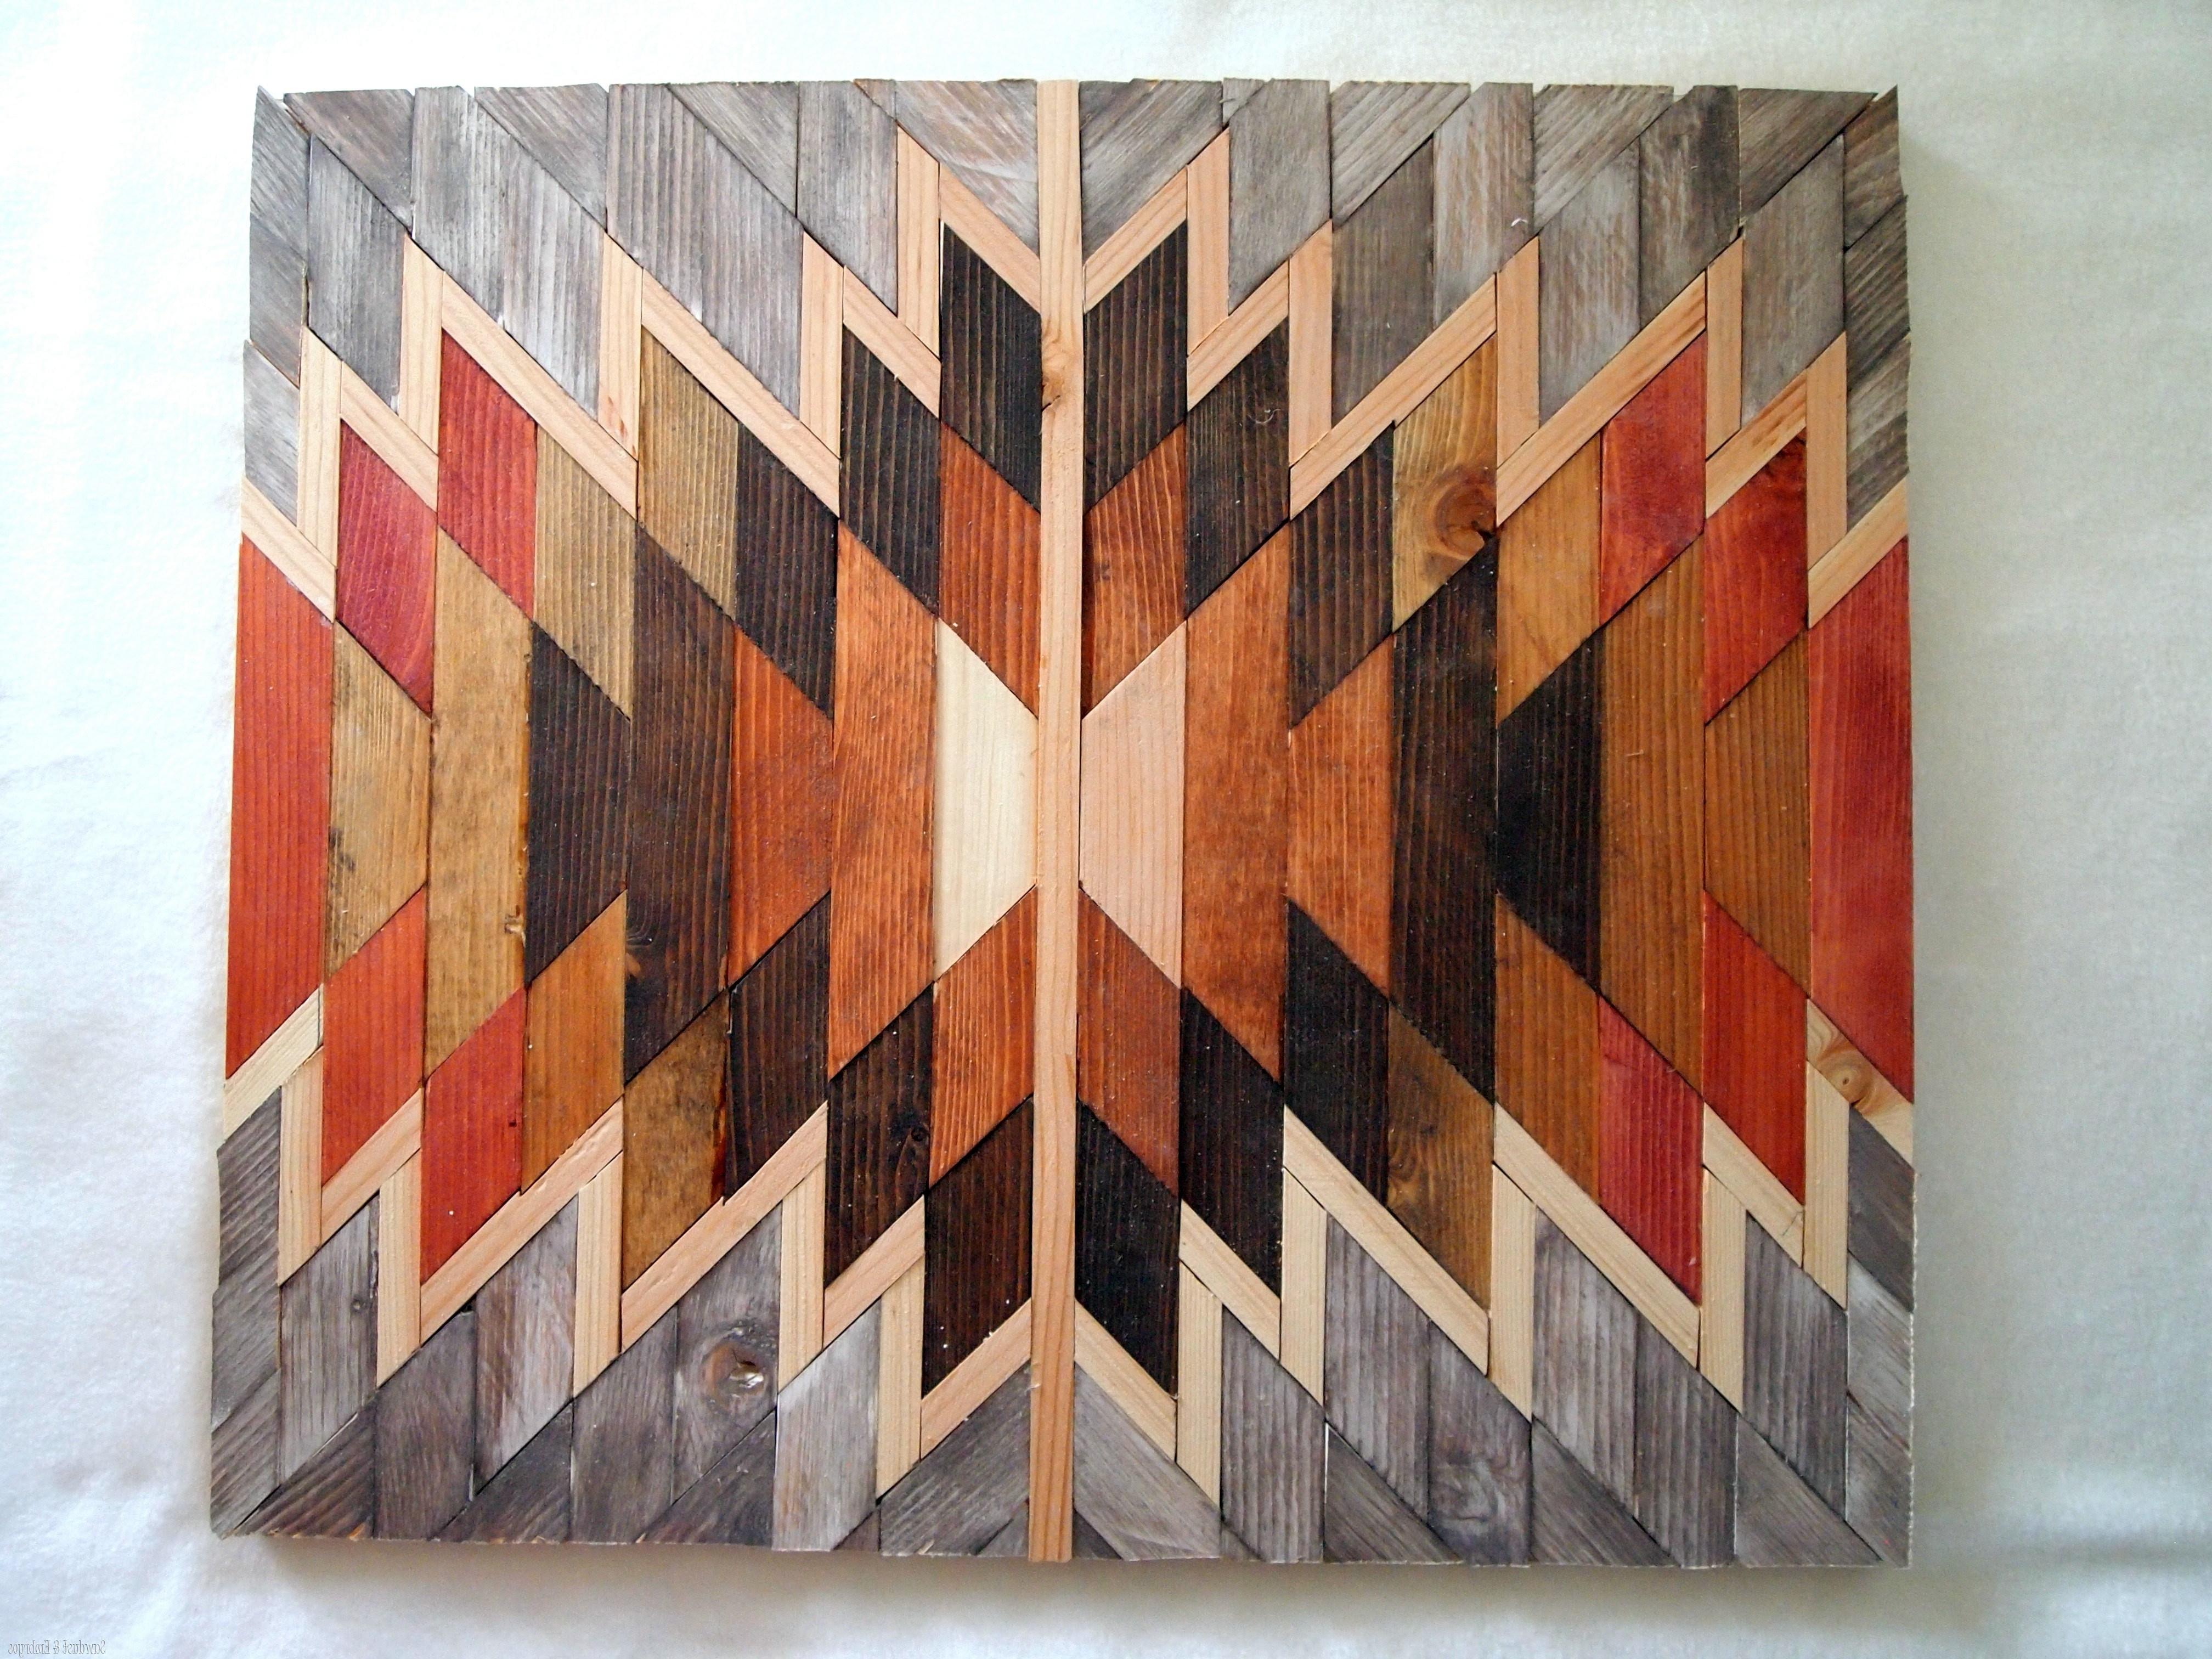 Native American Metal Wall Art – Elitflat For Trendy Native American Wall Art (View 3 of 15)